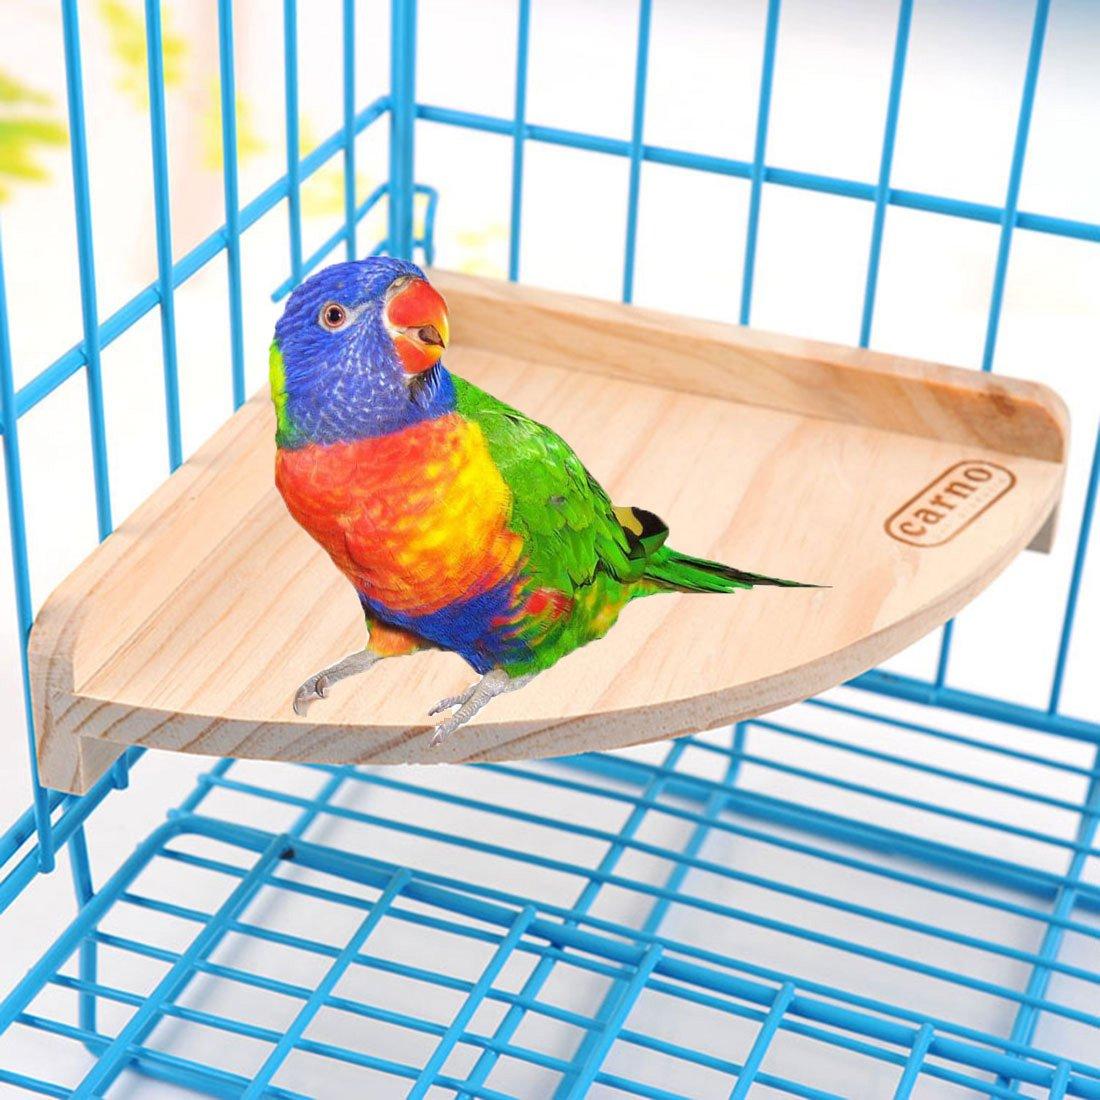 Wood Perch Platform for Bird Parrot Macaw African Greys Budgies Cockatoo Parakeet Conure Hamster Gerbil Rat Mouse Cage Shelf Toy